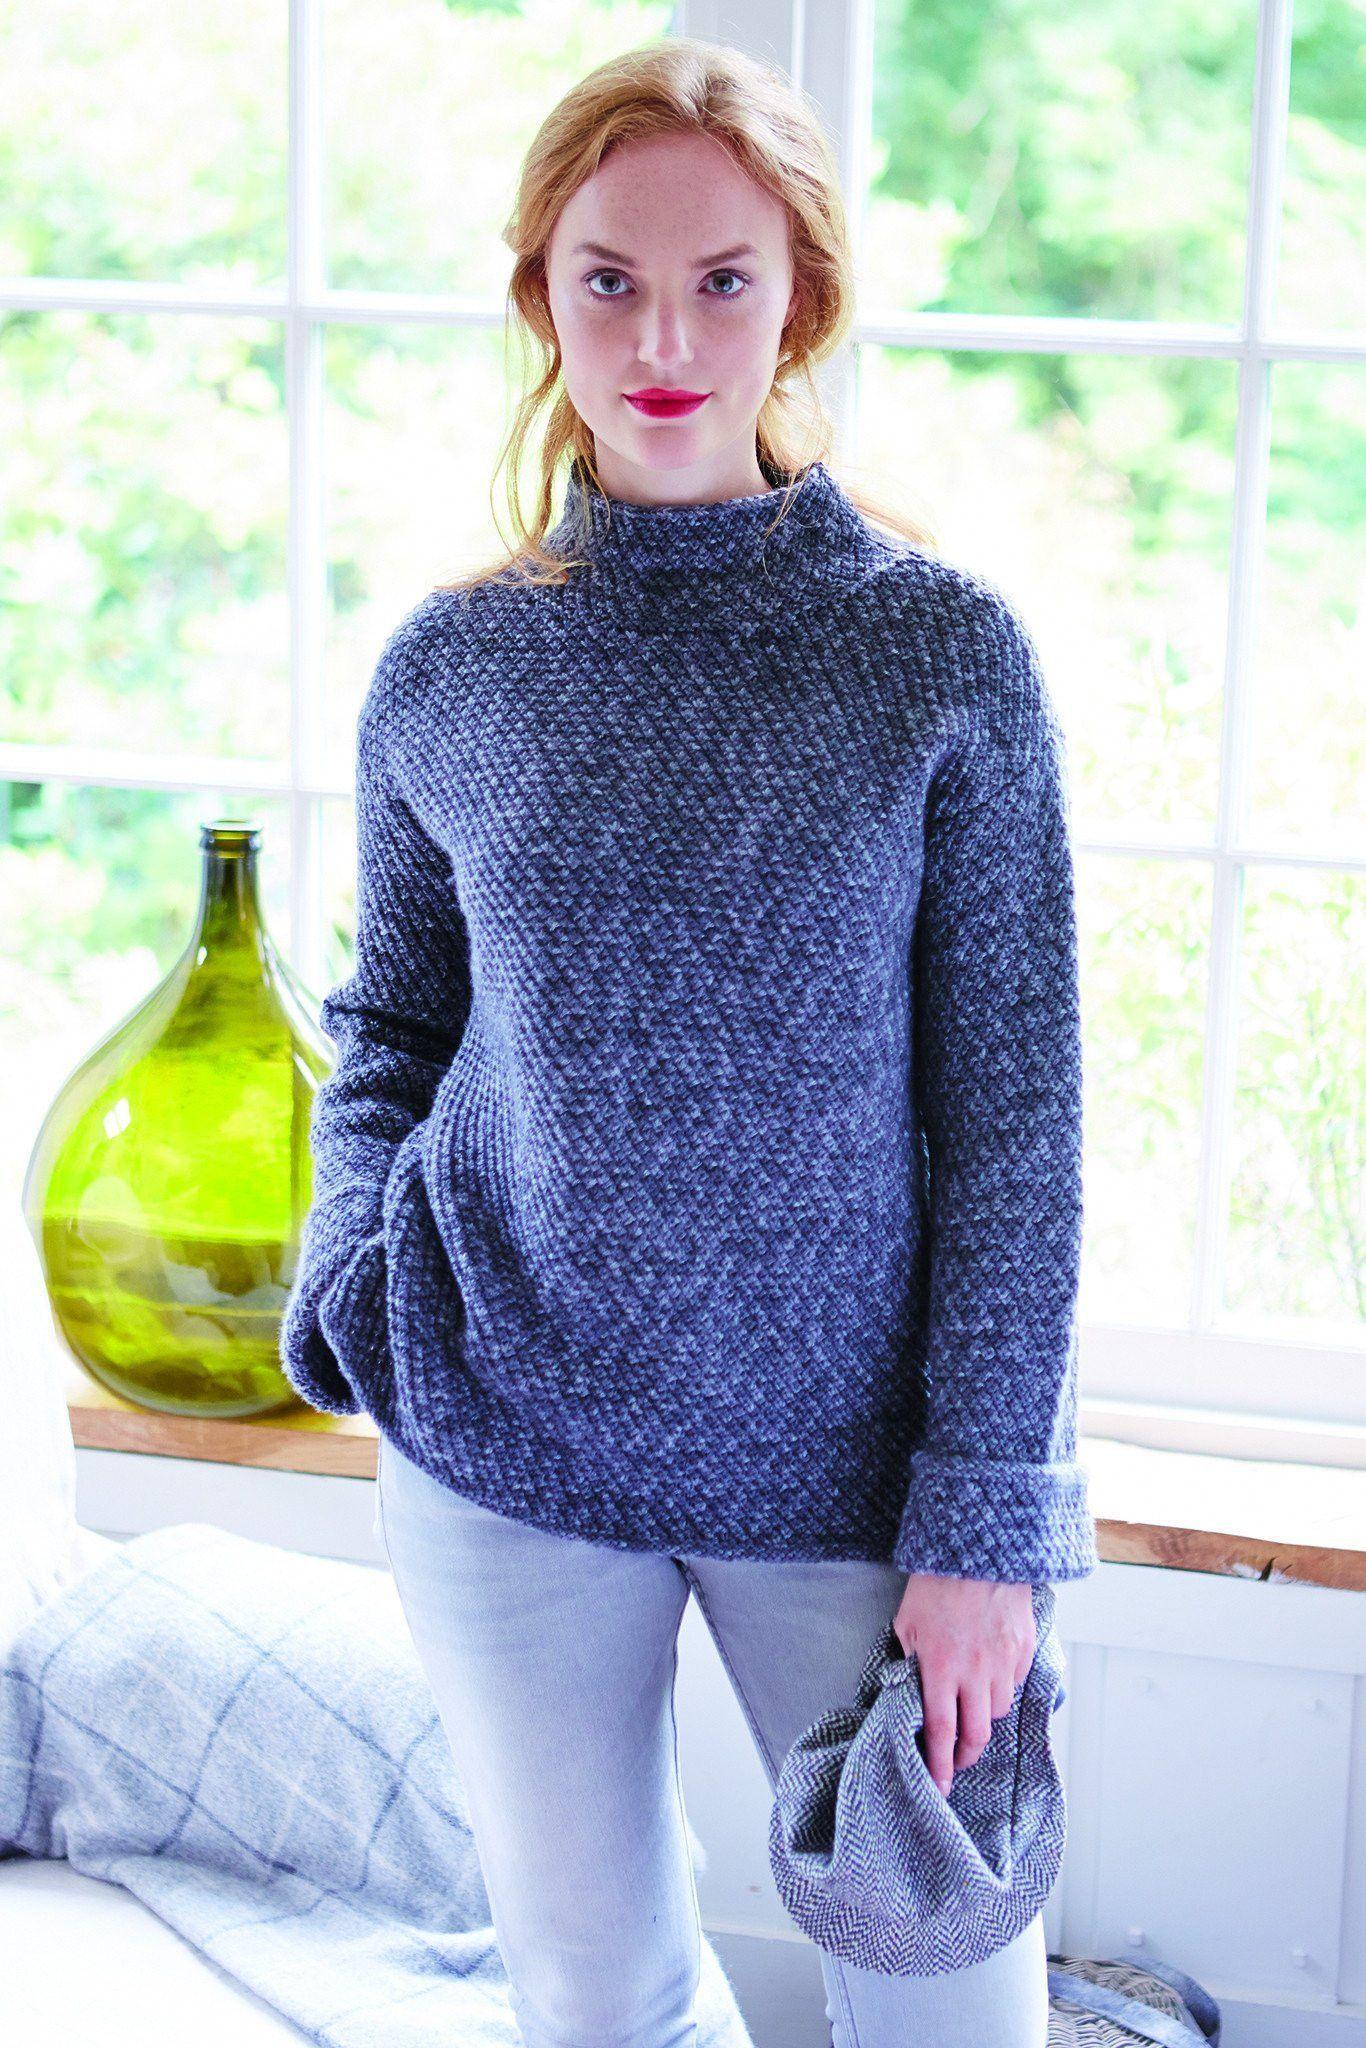 Womens Funnel-Neck Jumper Knitting Pattern | The Knitting ...